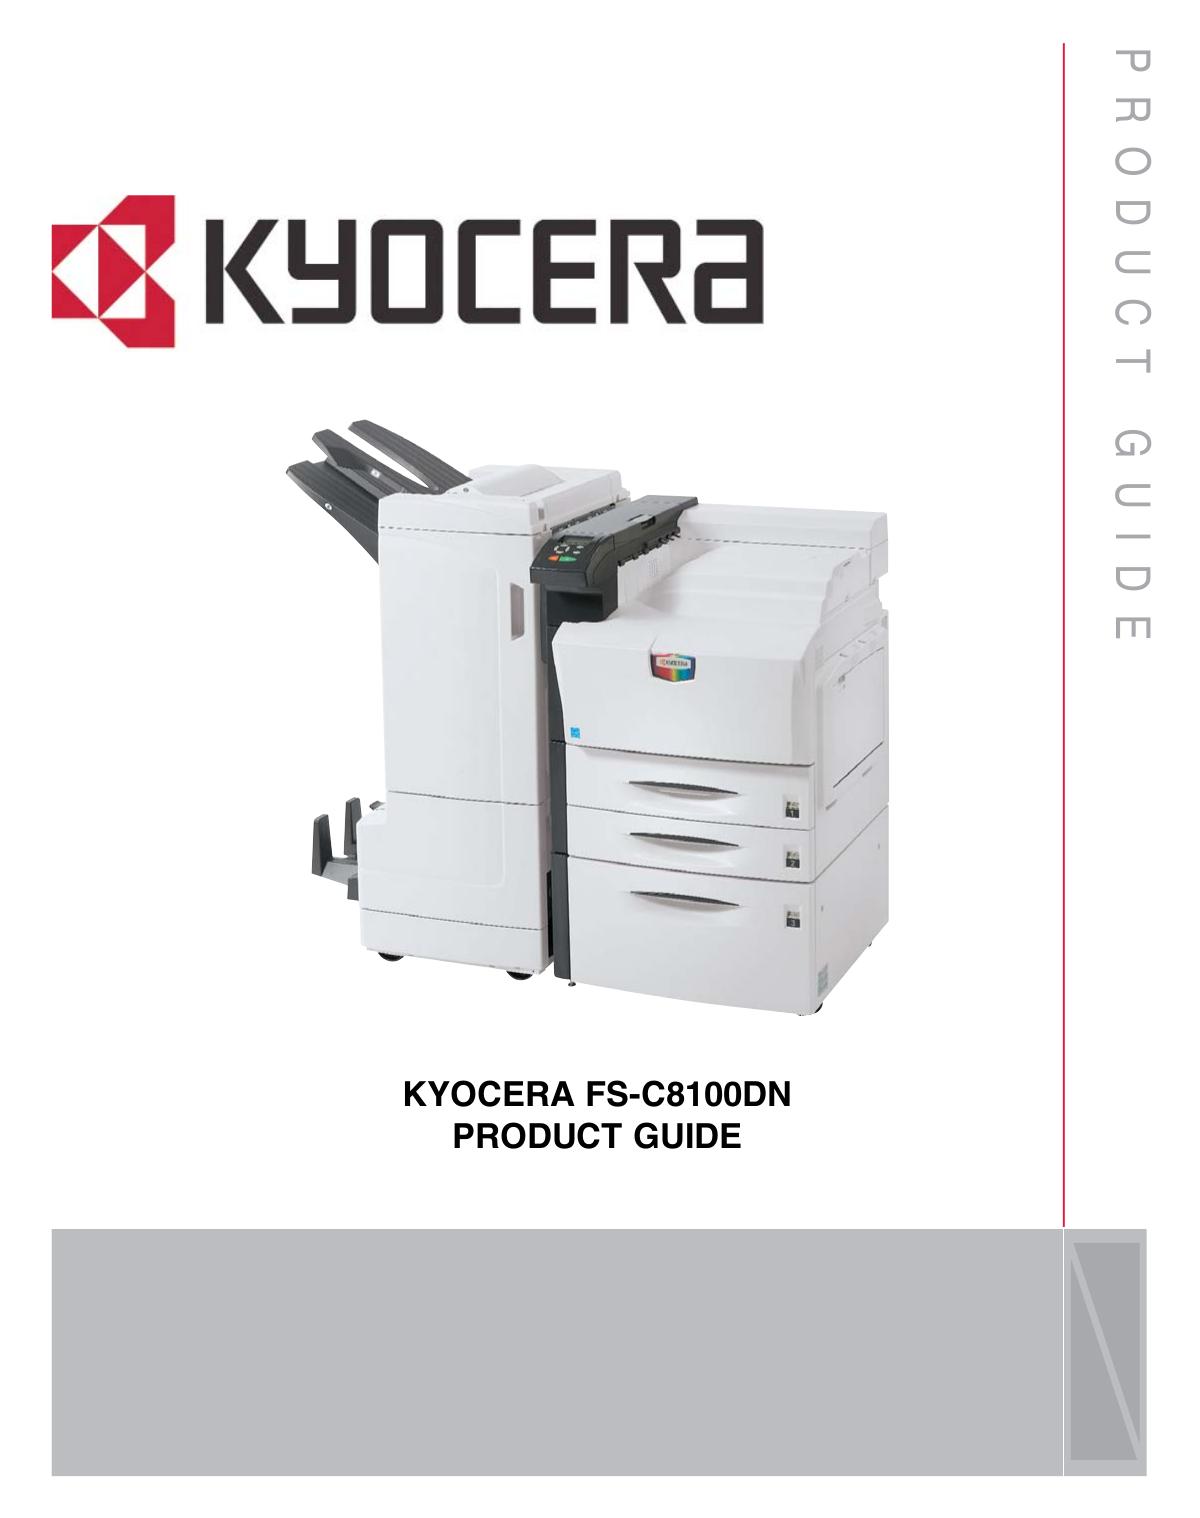 kyocera printers error when printing pdf